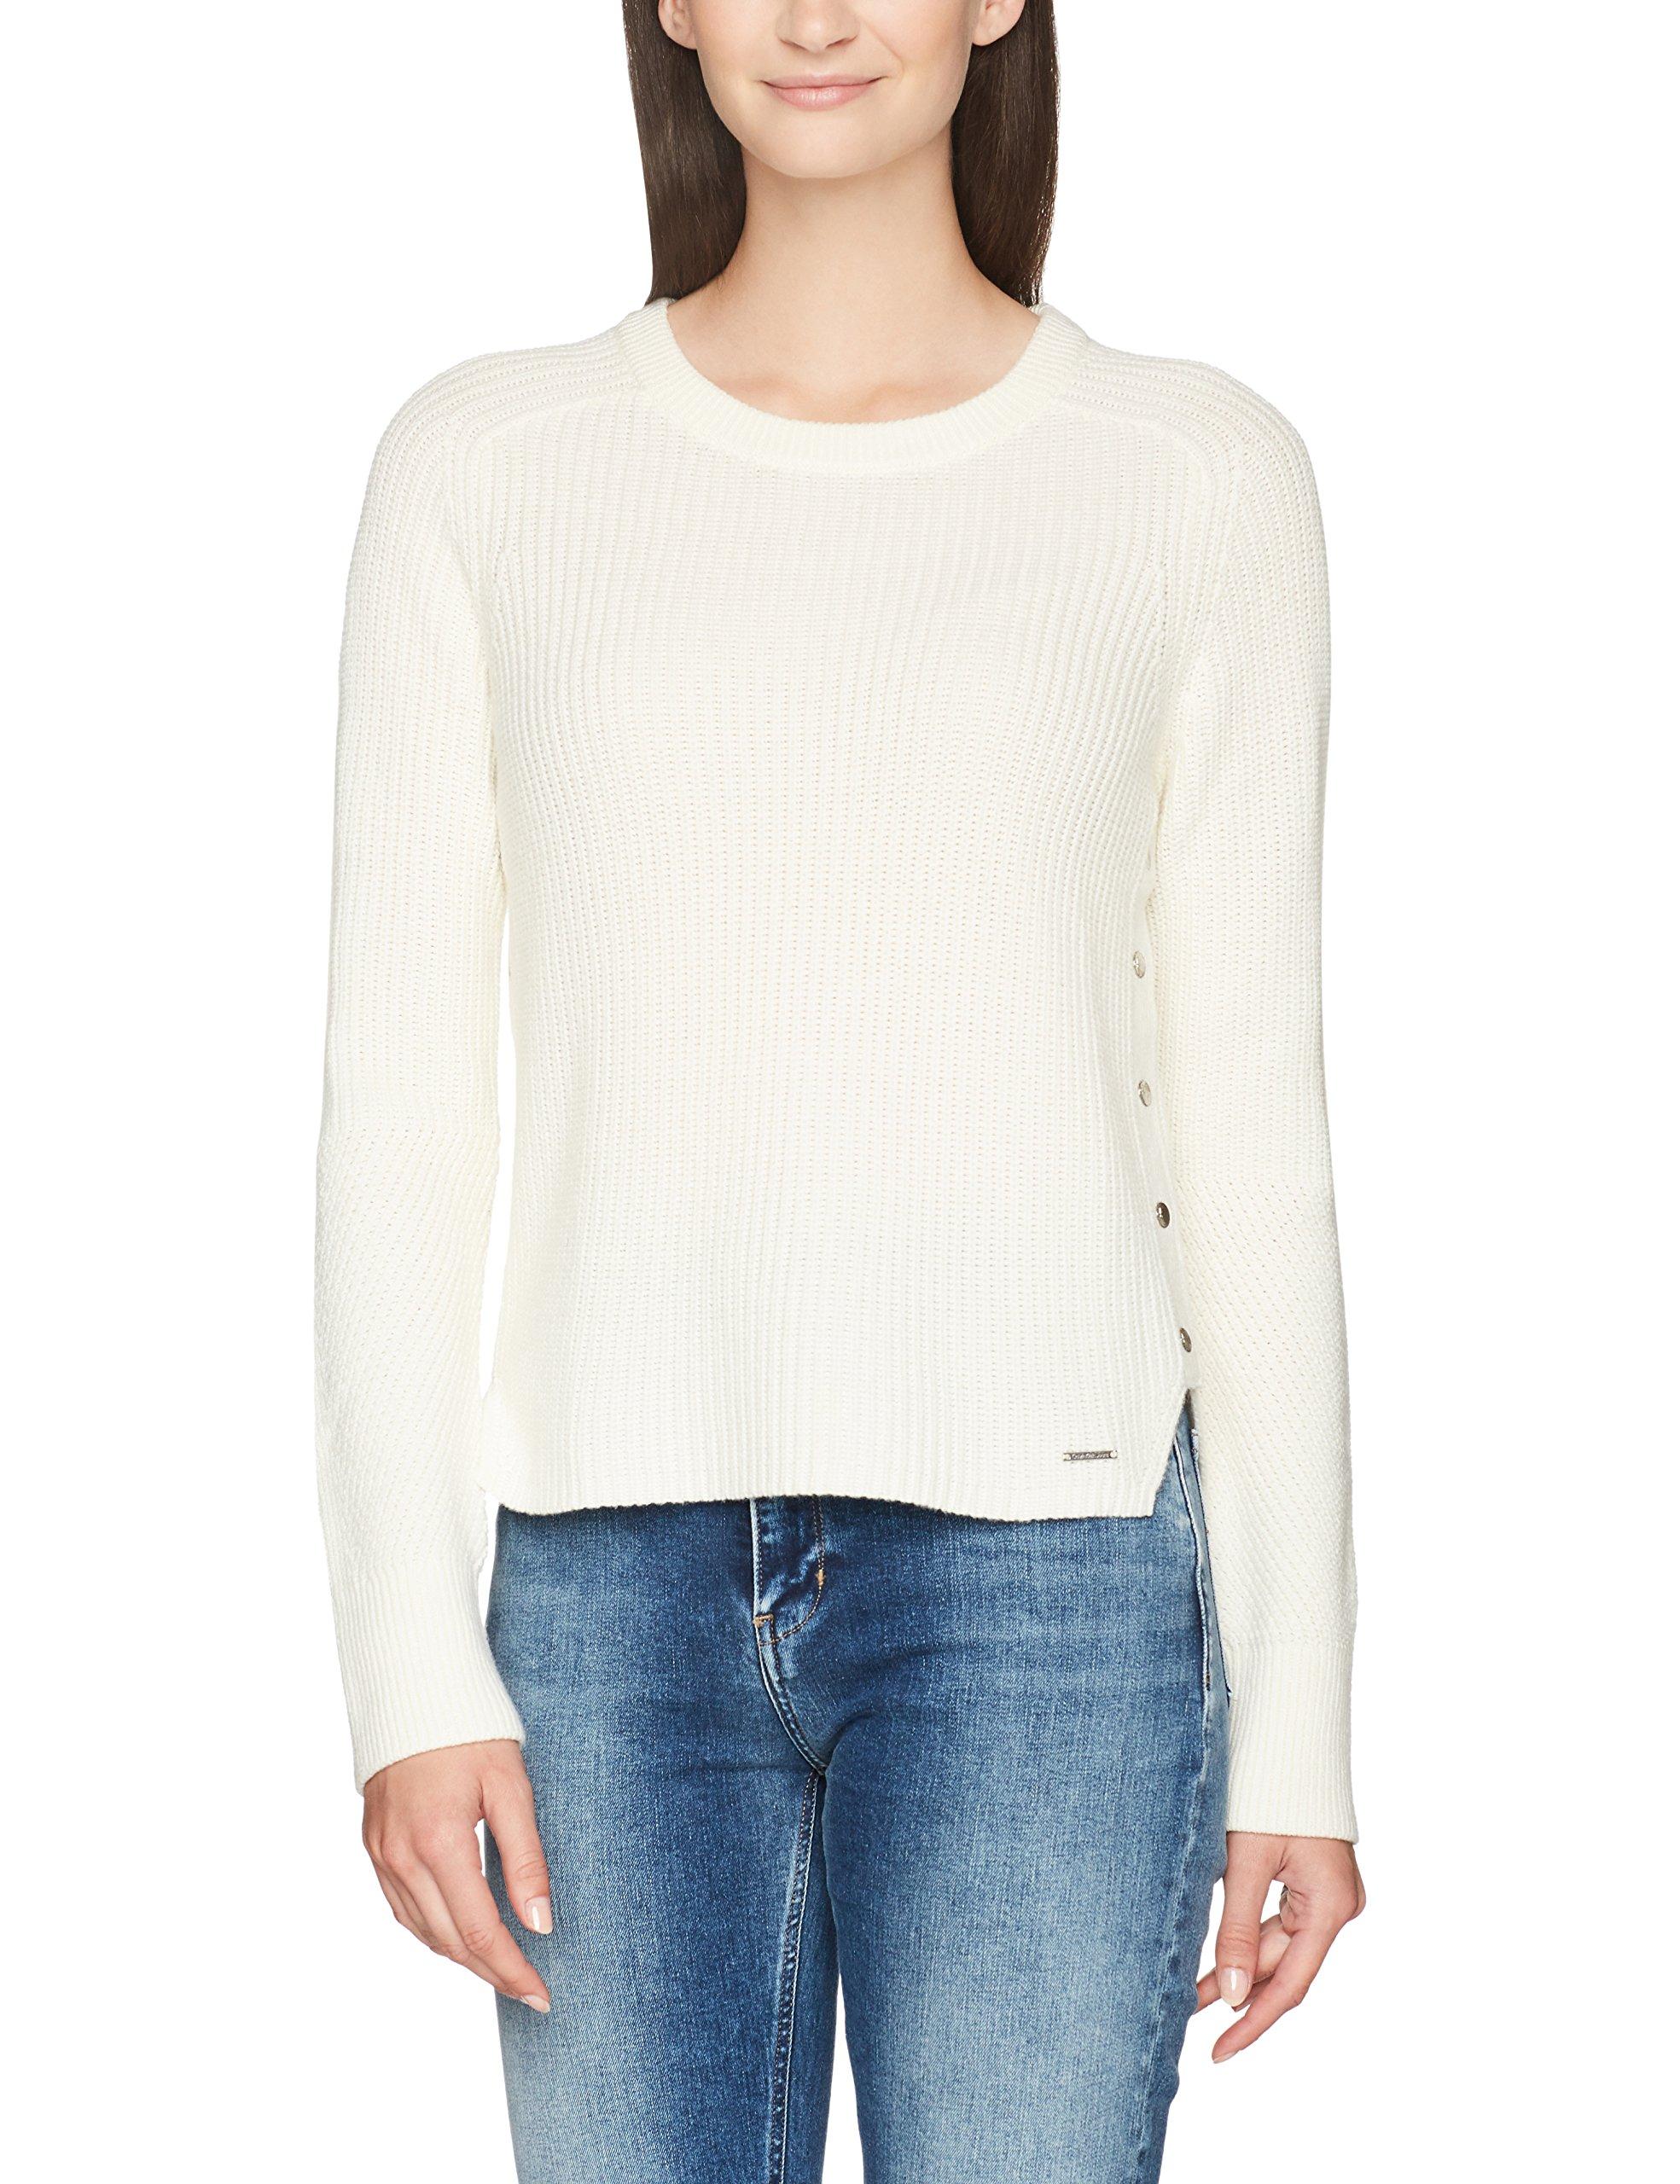 Sweater LsPull Klein FabricantS FemmeBlancbright Cn White Calvin Swan 112Smalltaille Jeans VpUMqSGz